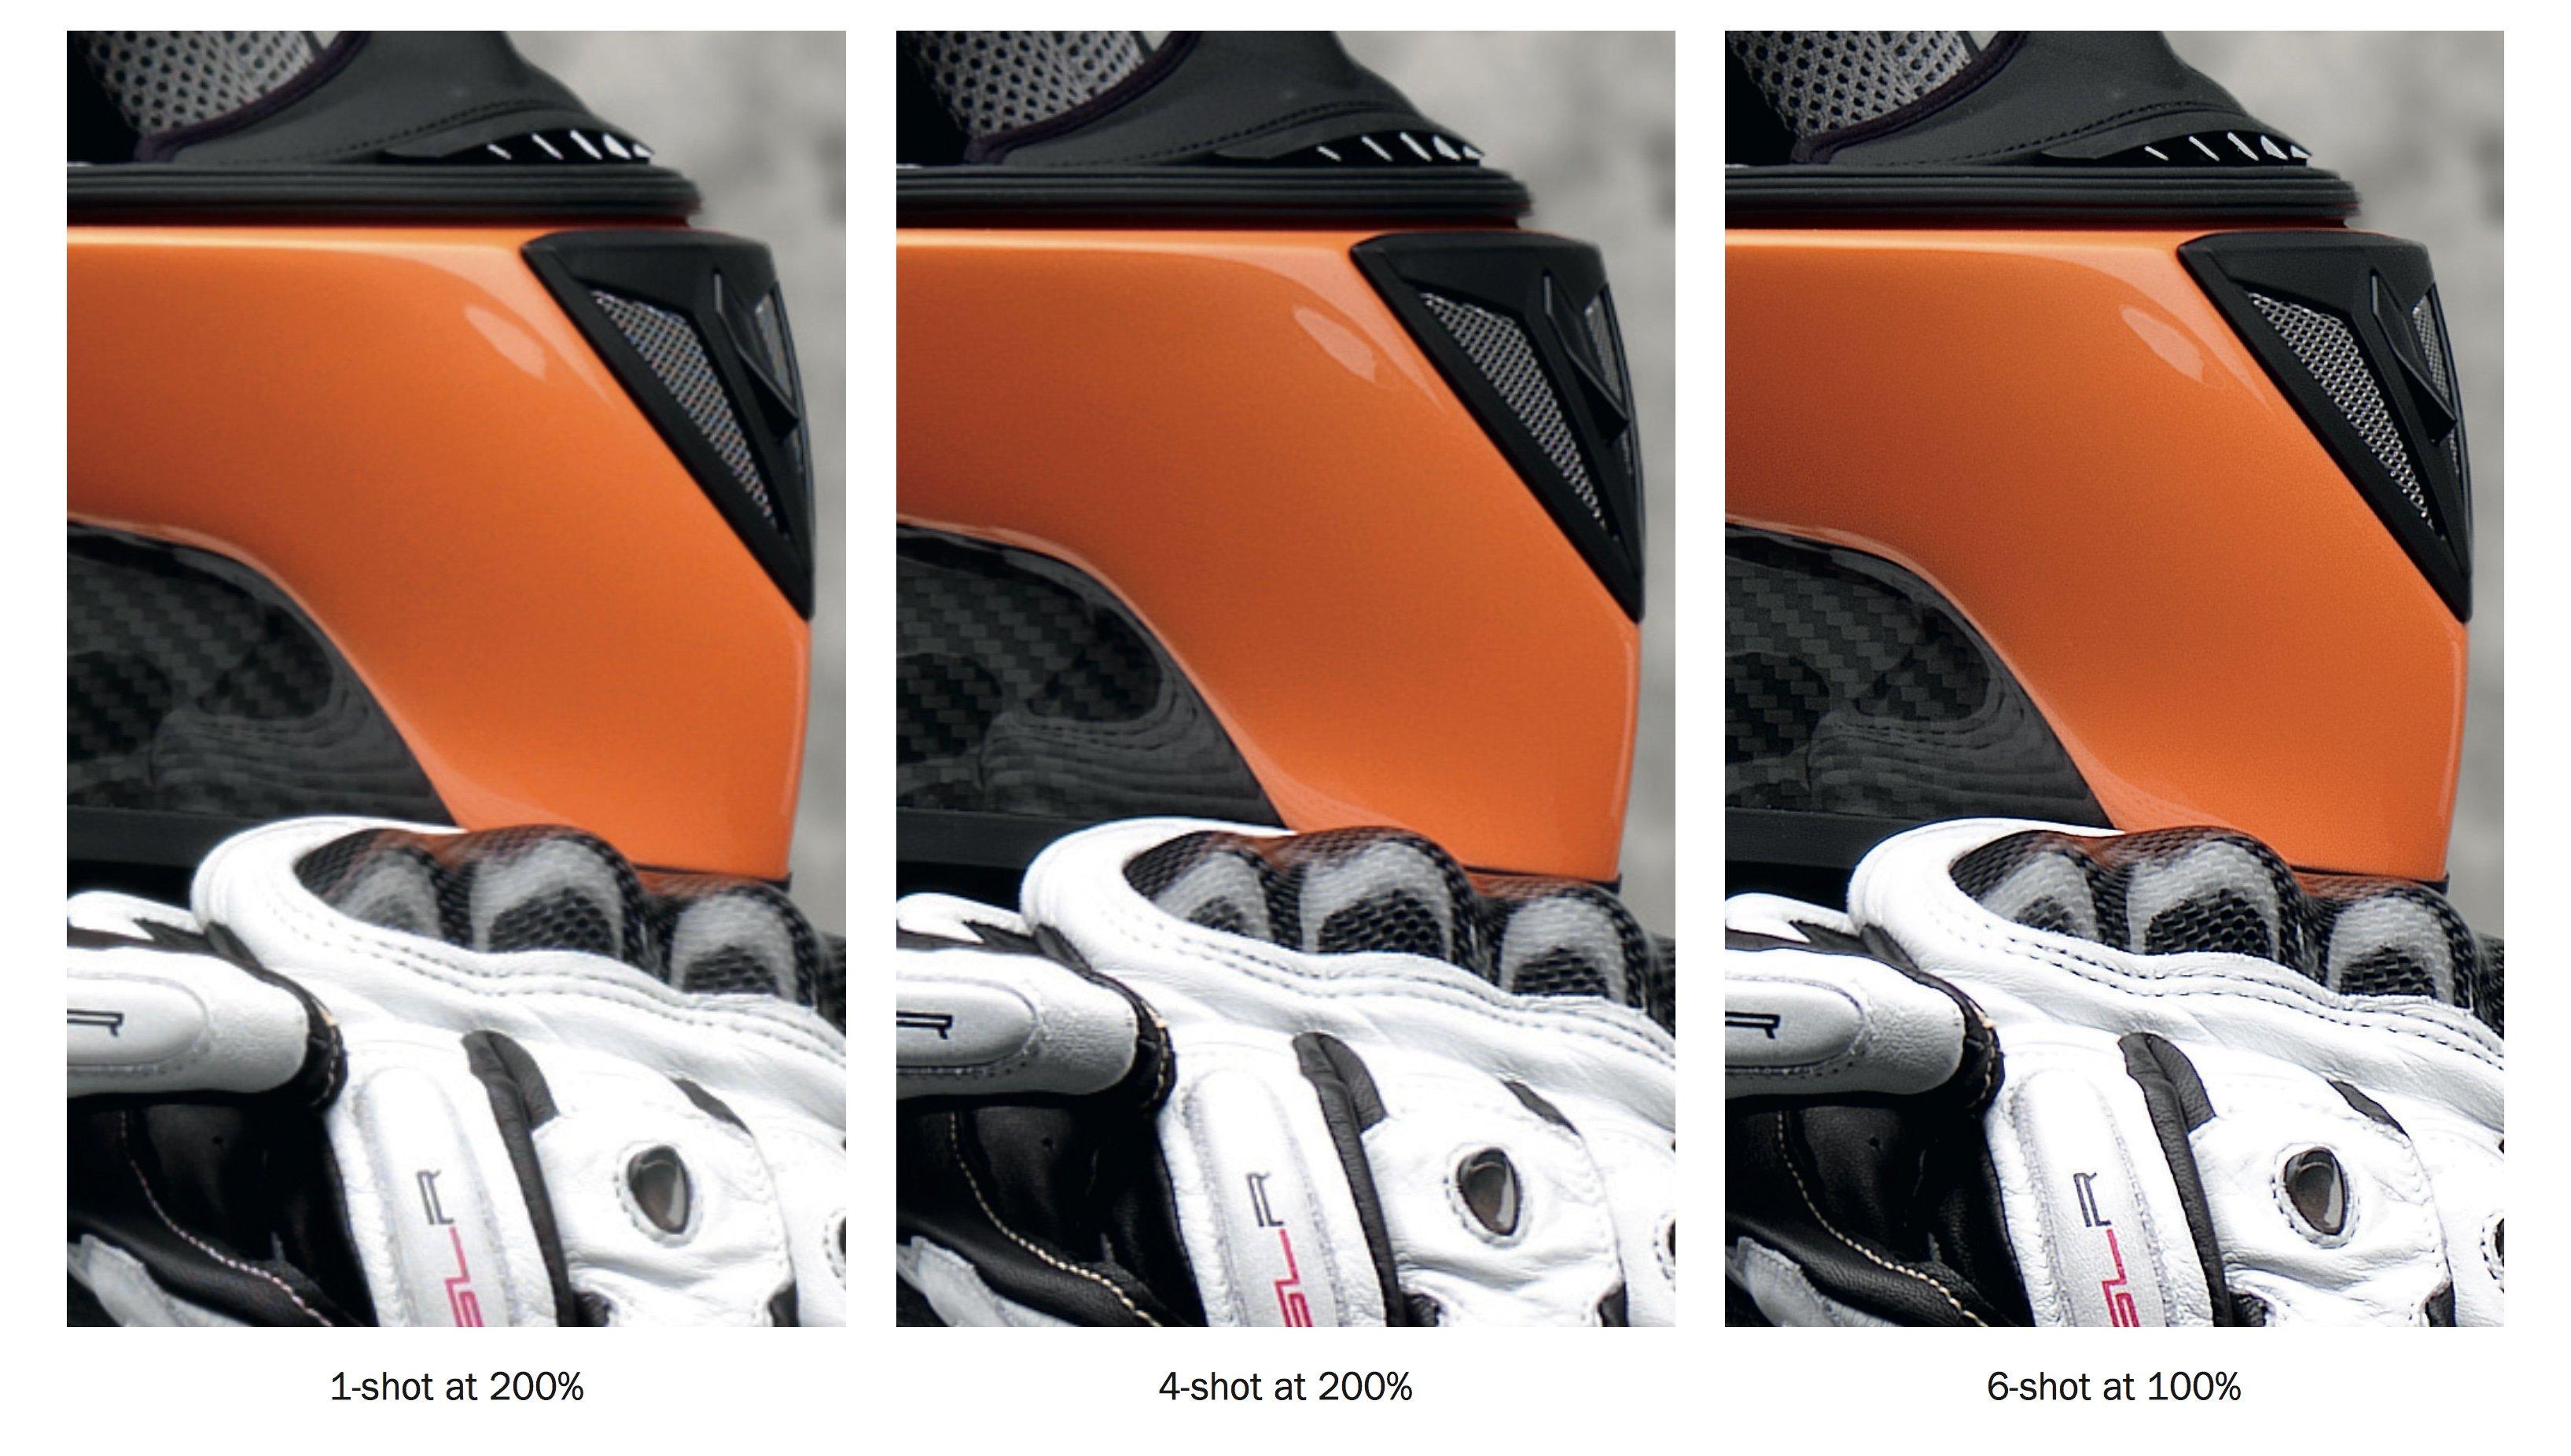 multishot pixel shifting sensor